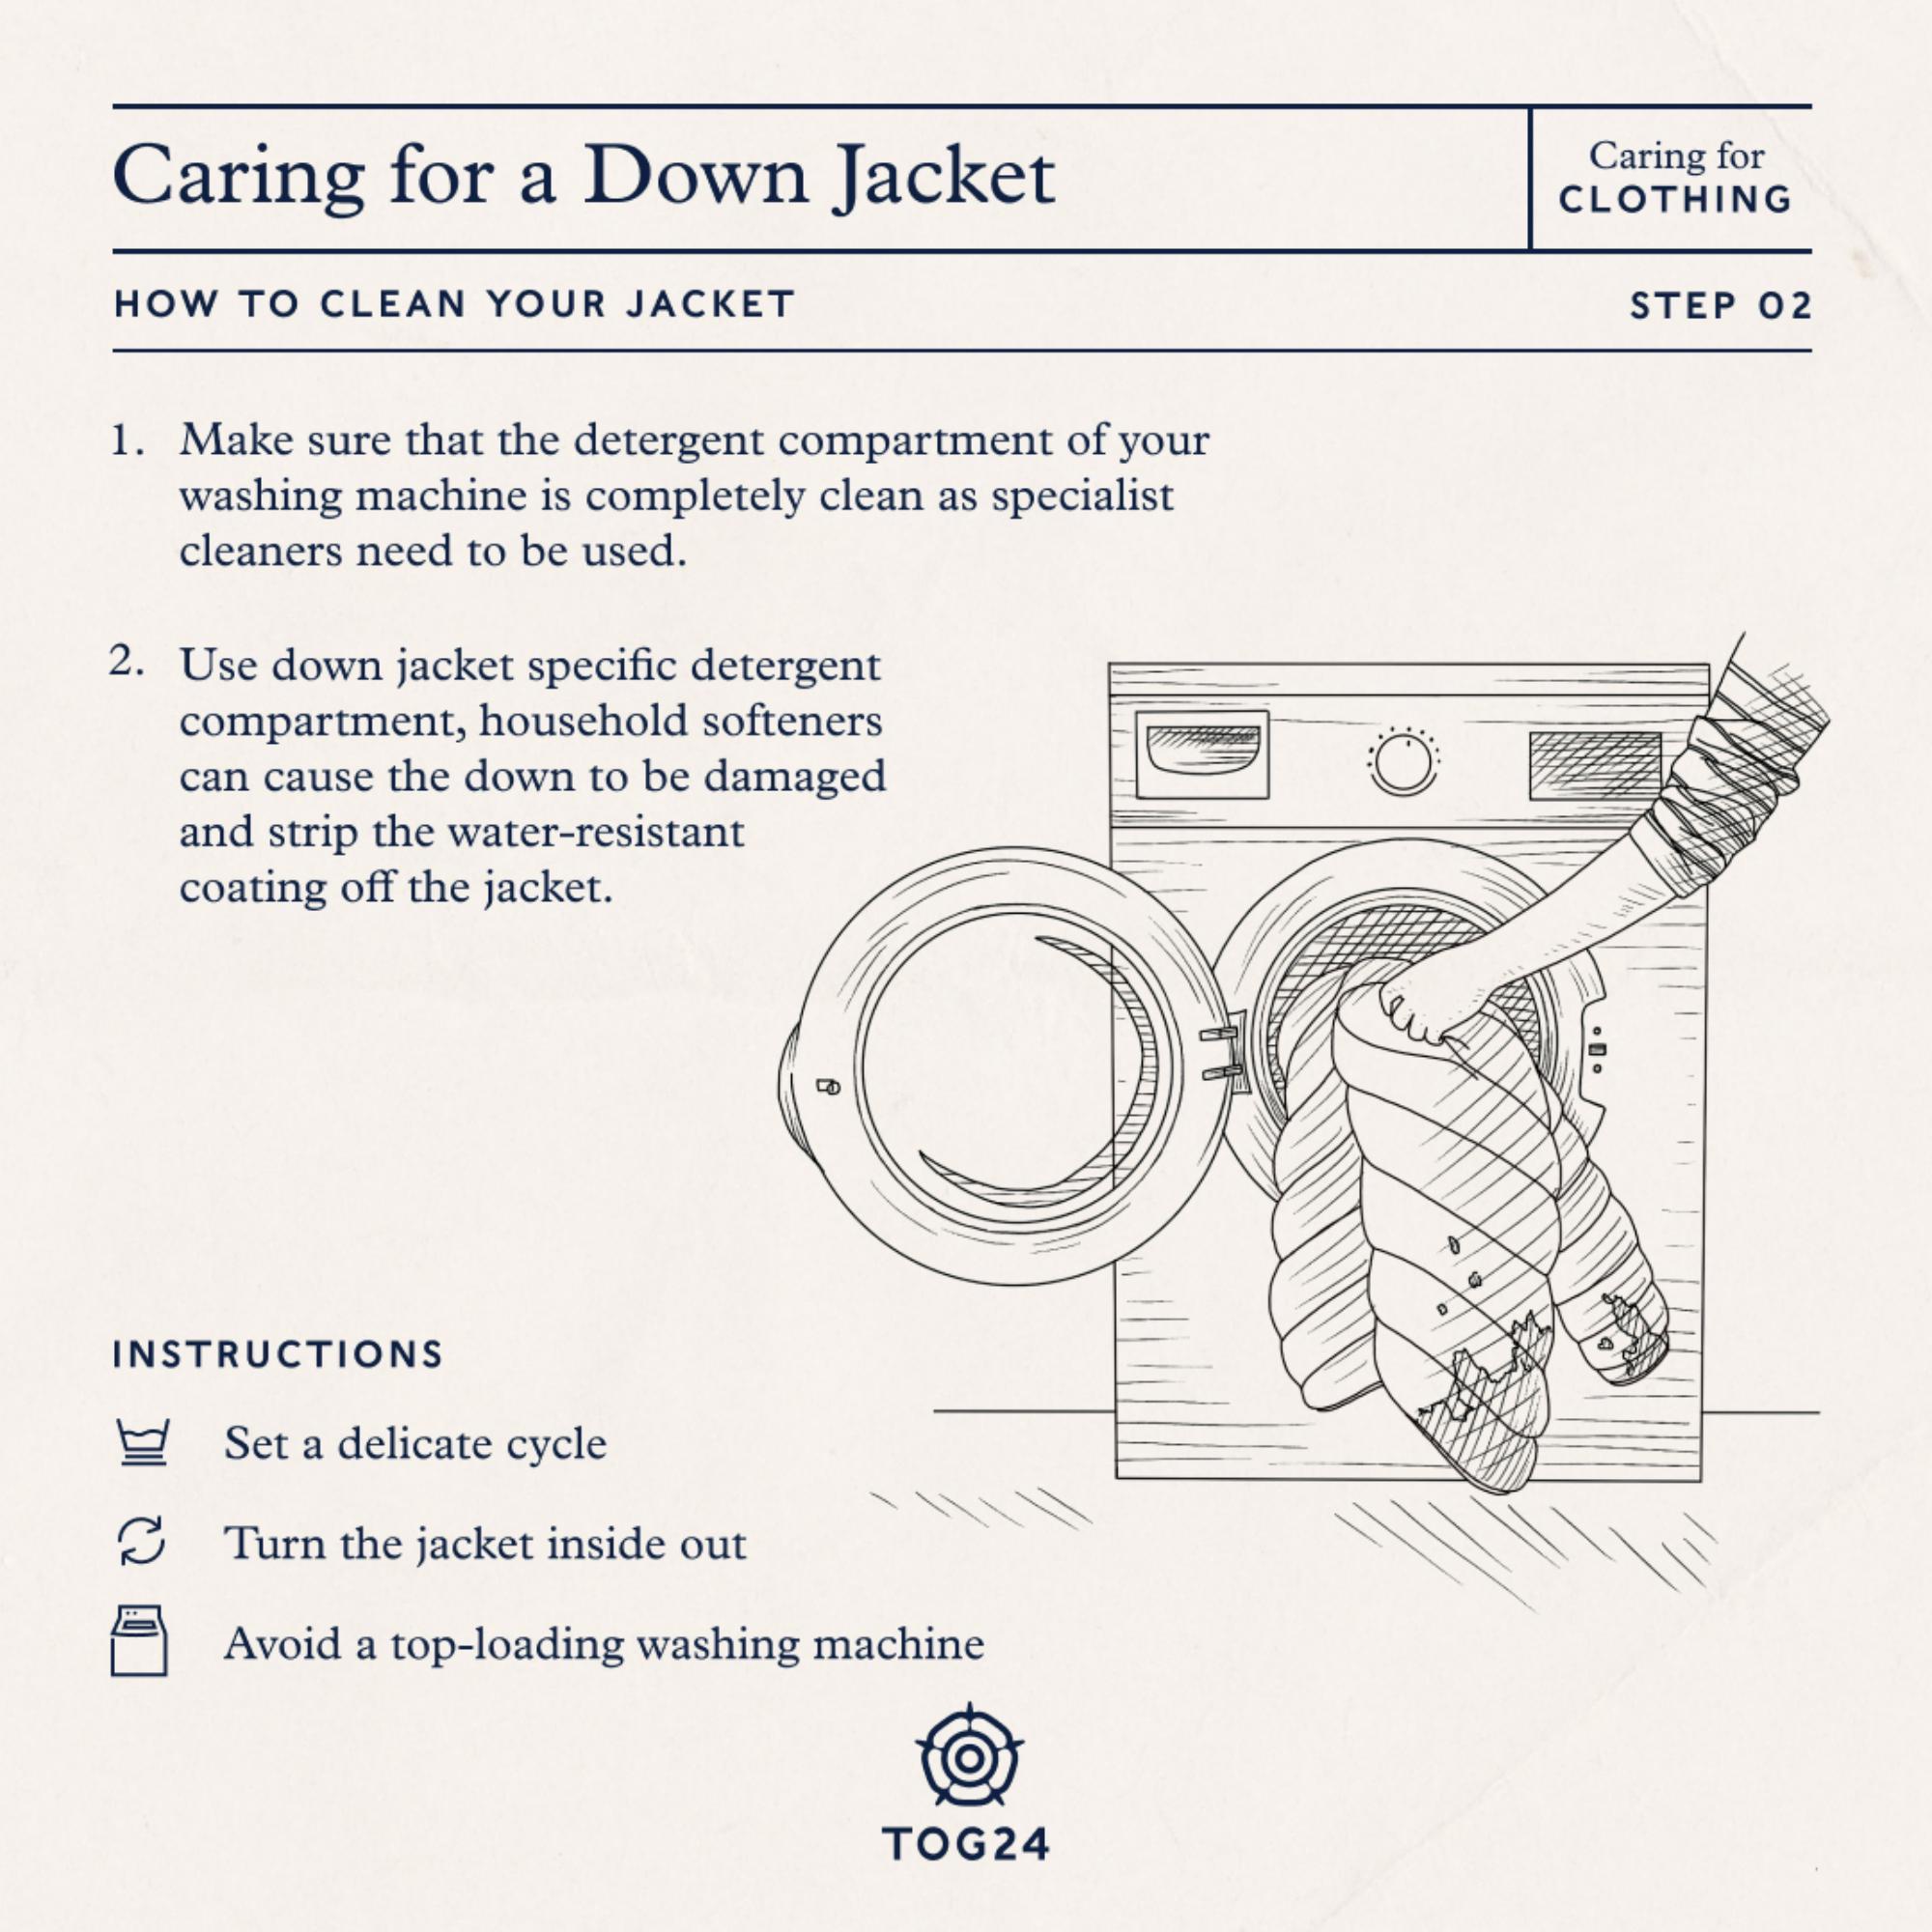 puffa jacket 2